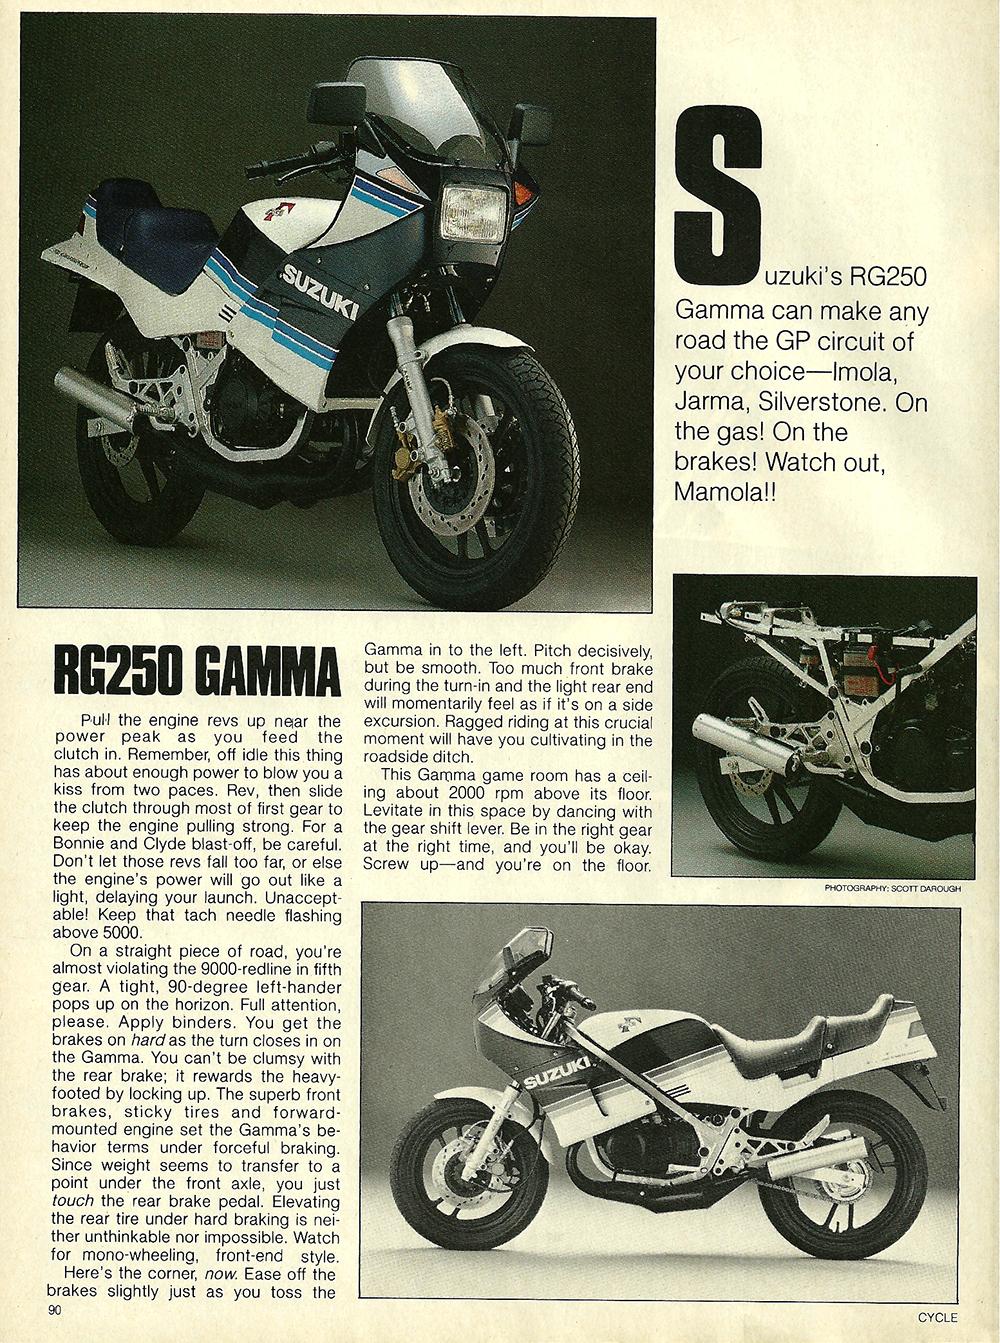 1984 Suzuki RG250 Gamma road test 3.jpg